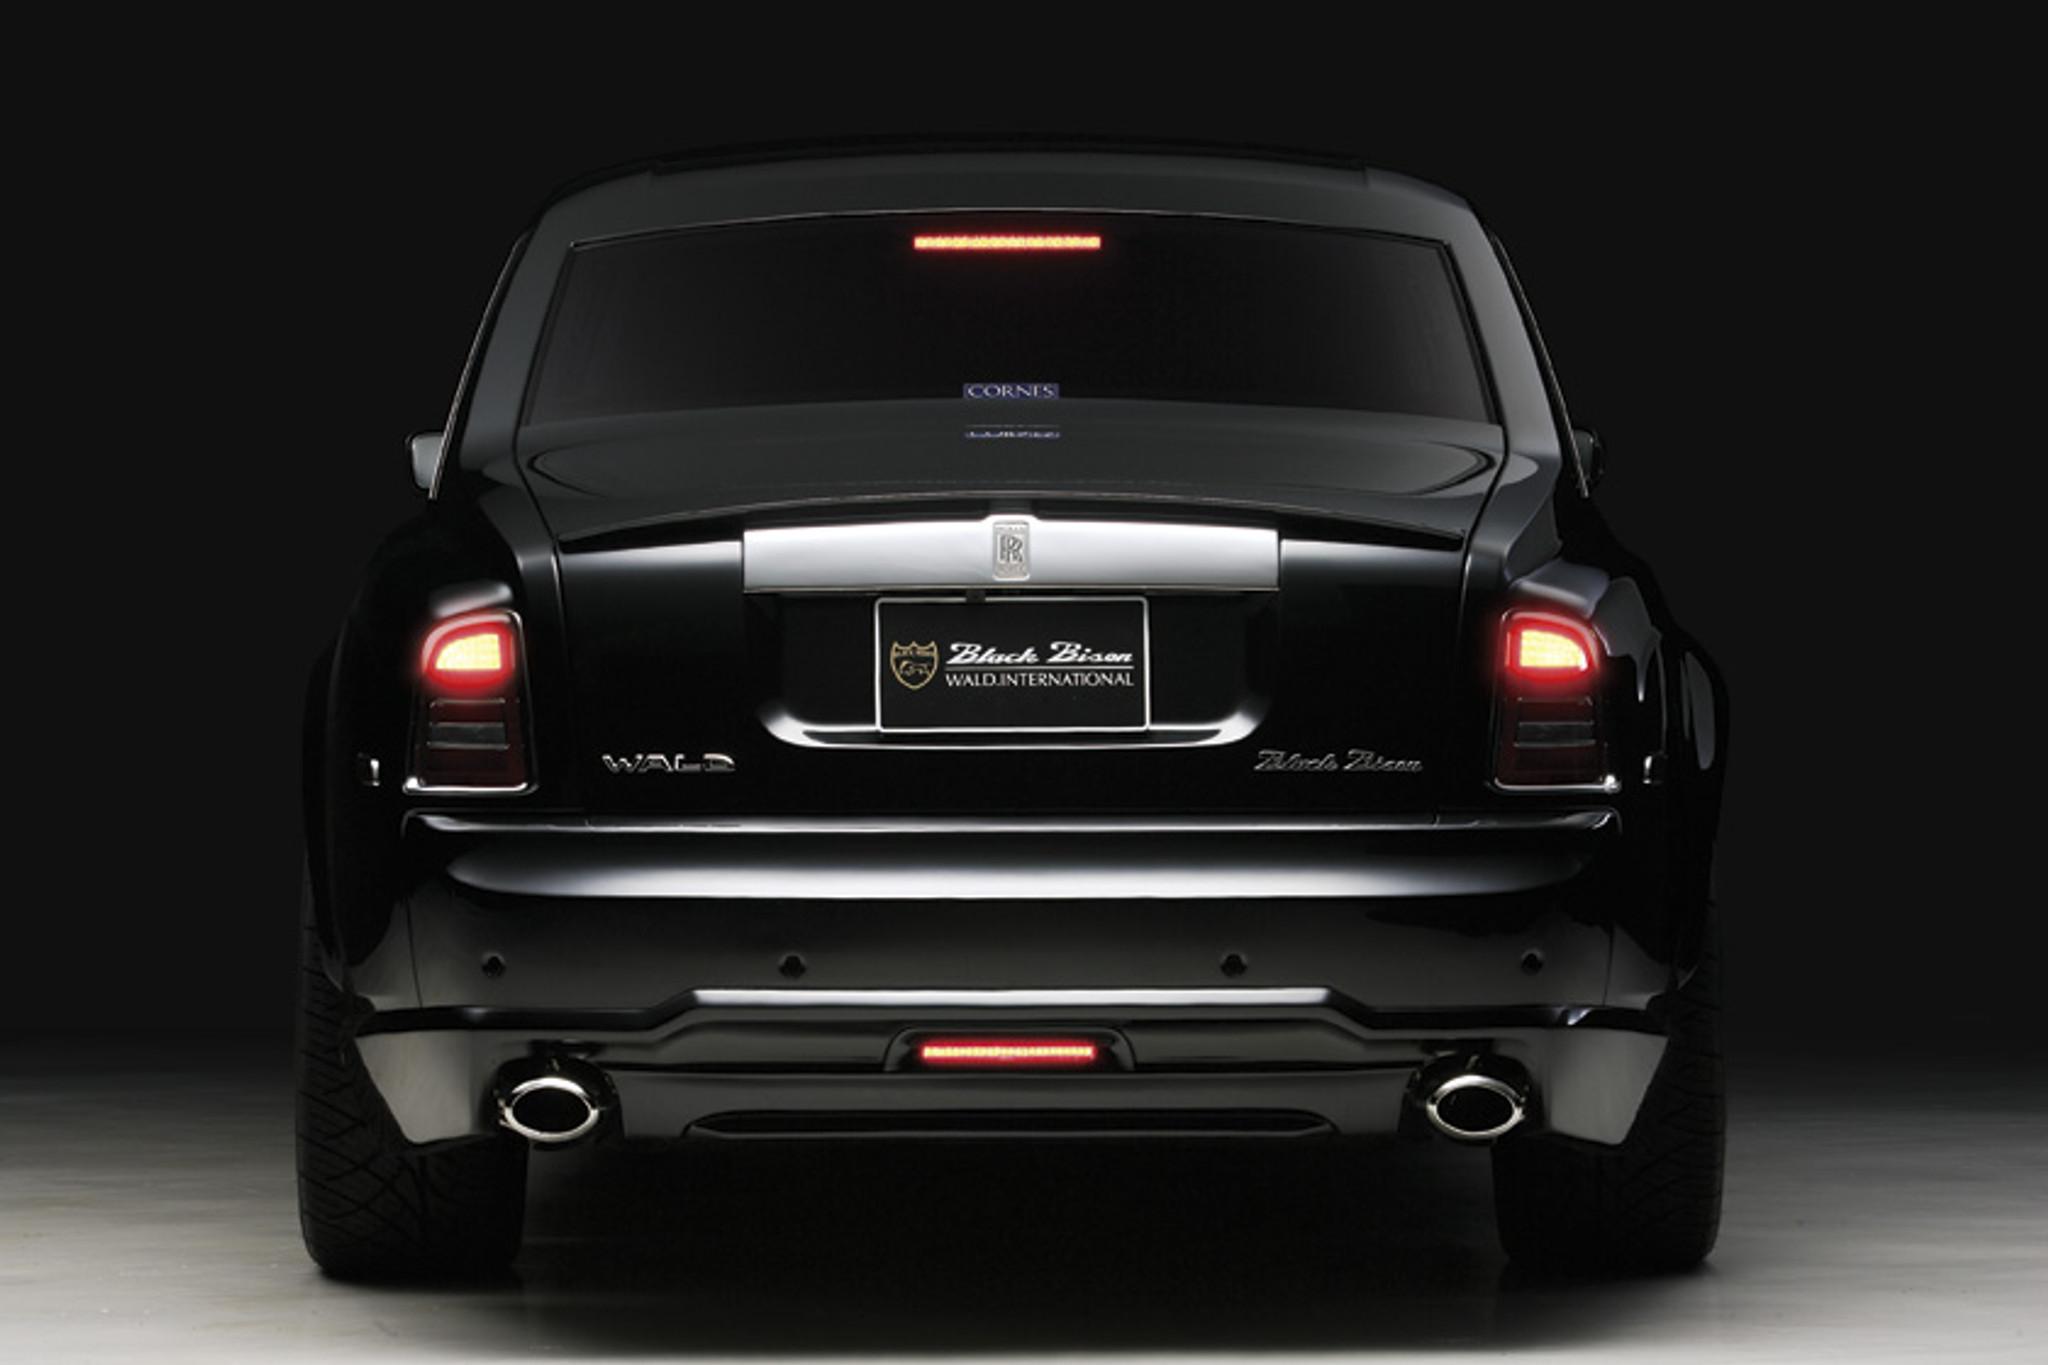 Rolls Royce Phantom Sports Line Black Bison Edition Body